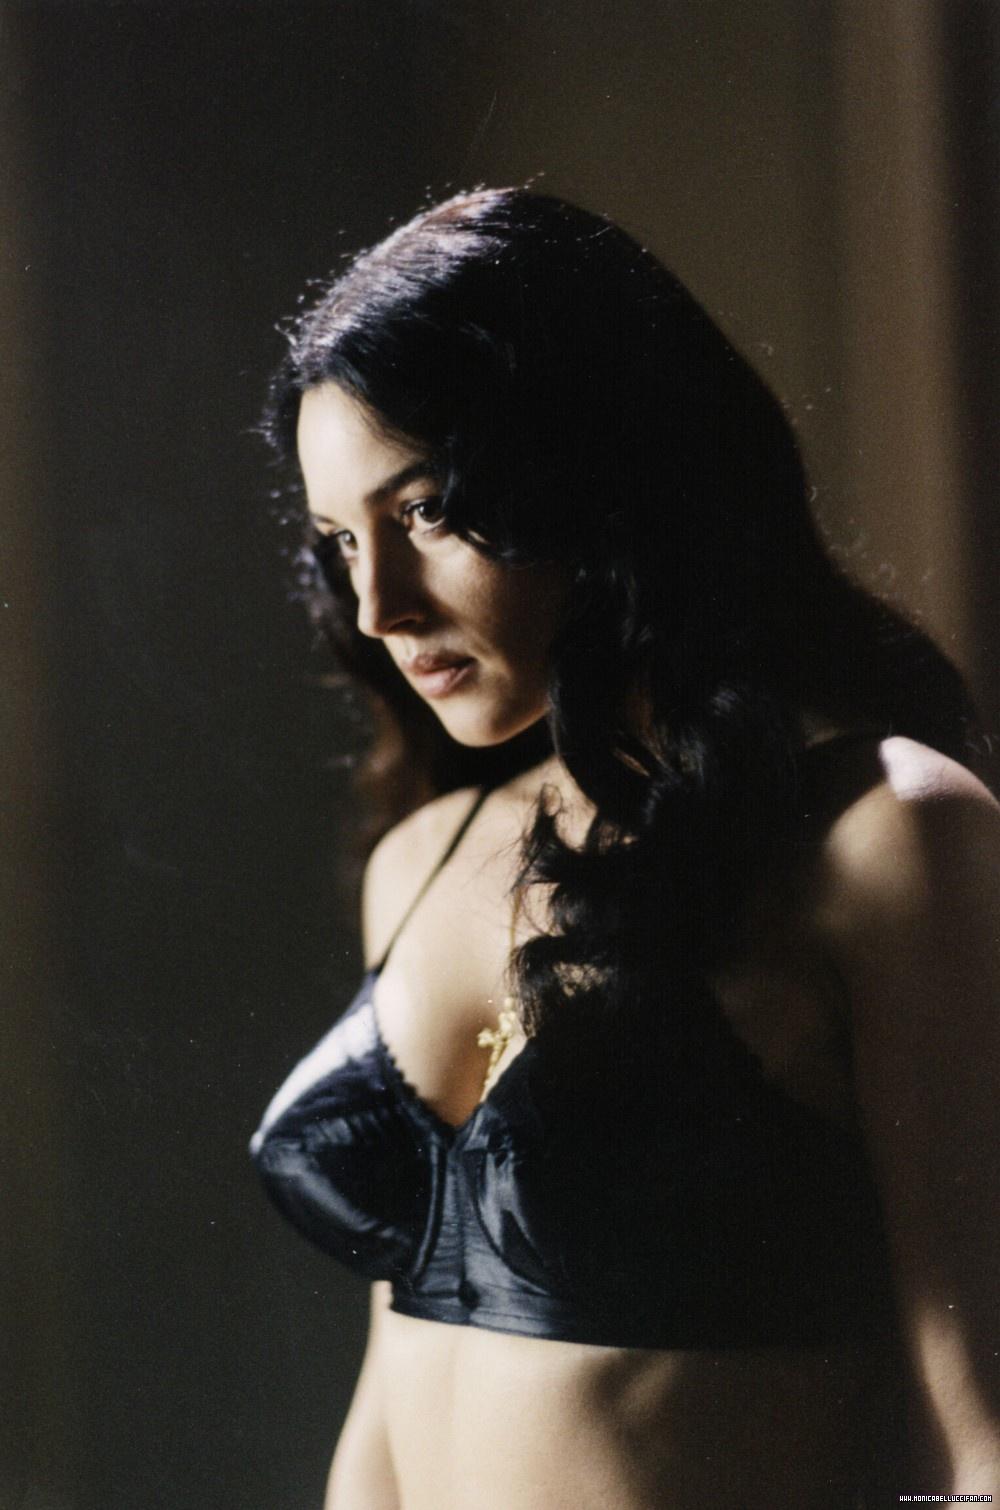 http://2.bp.blogspot.com/-nEDvWxFmFeQ/TdZNMibFsOI/AAAAAAAAB5o/fRD08HH69Oc/s1600/Hot+Pics+of+Monica+Bellucci+From+The+Movie+Malena+4.jpg